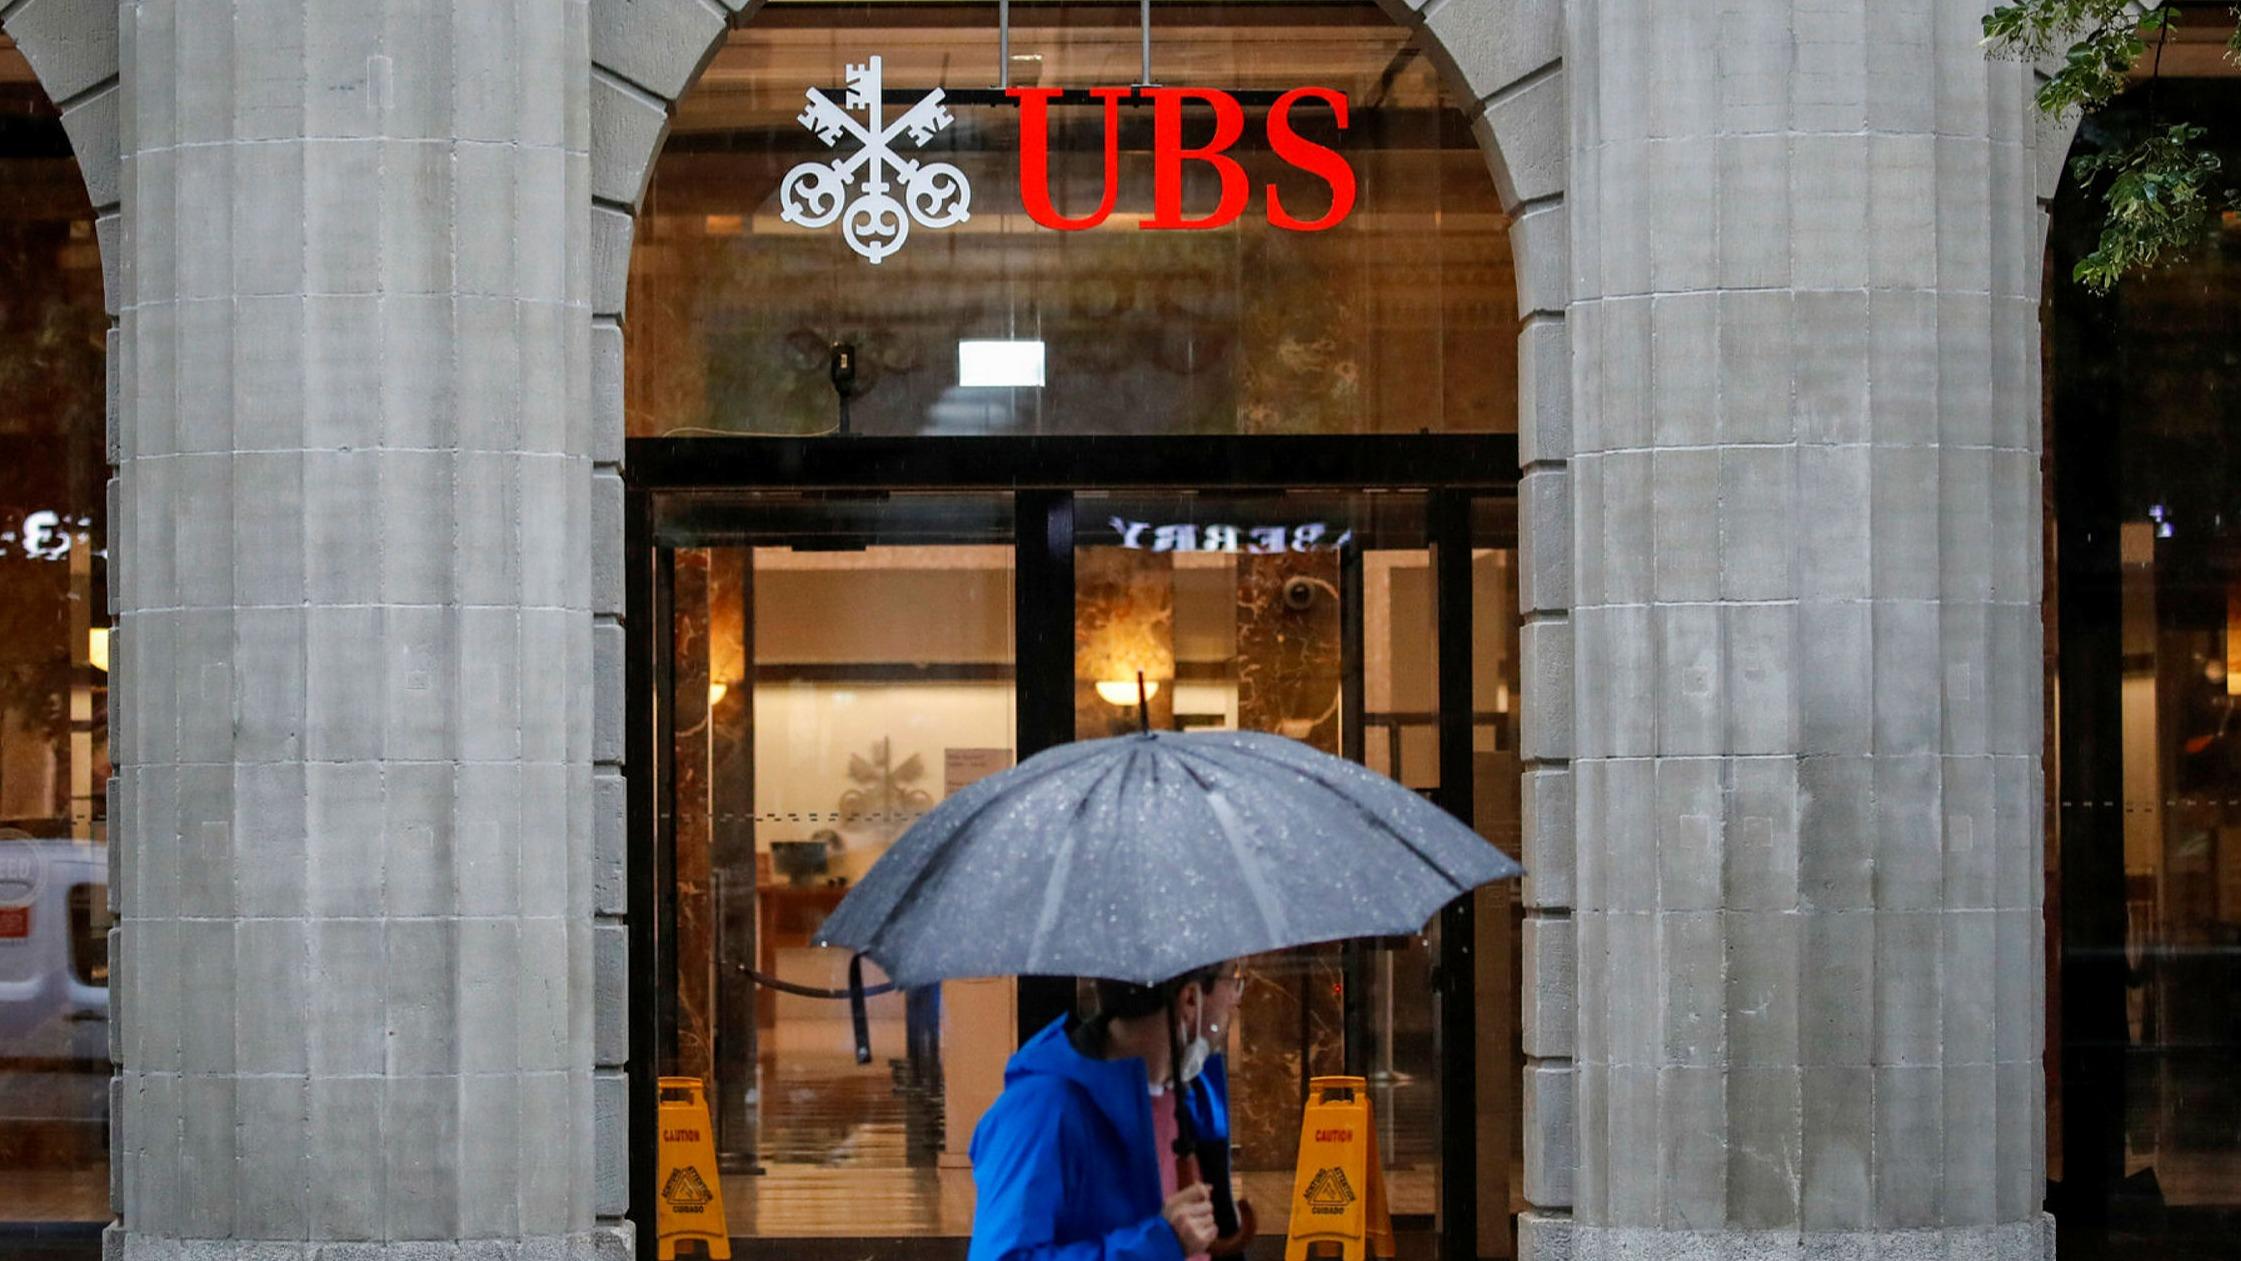 ft.com - Owen Walker - Thriving markets help UBS increase wealth management profits by 43%